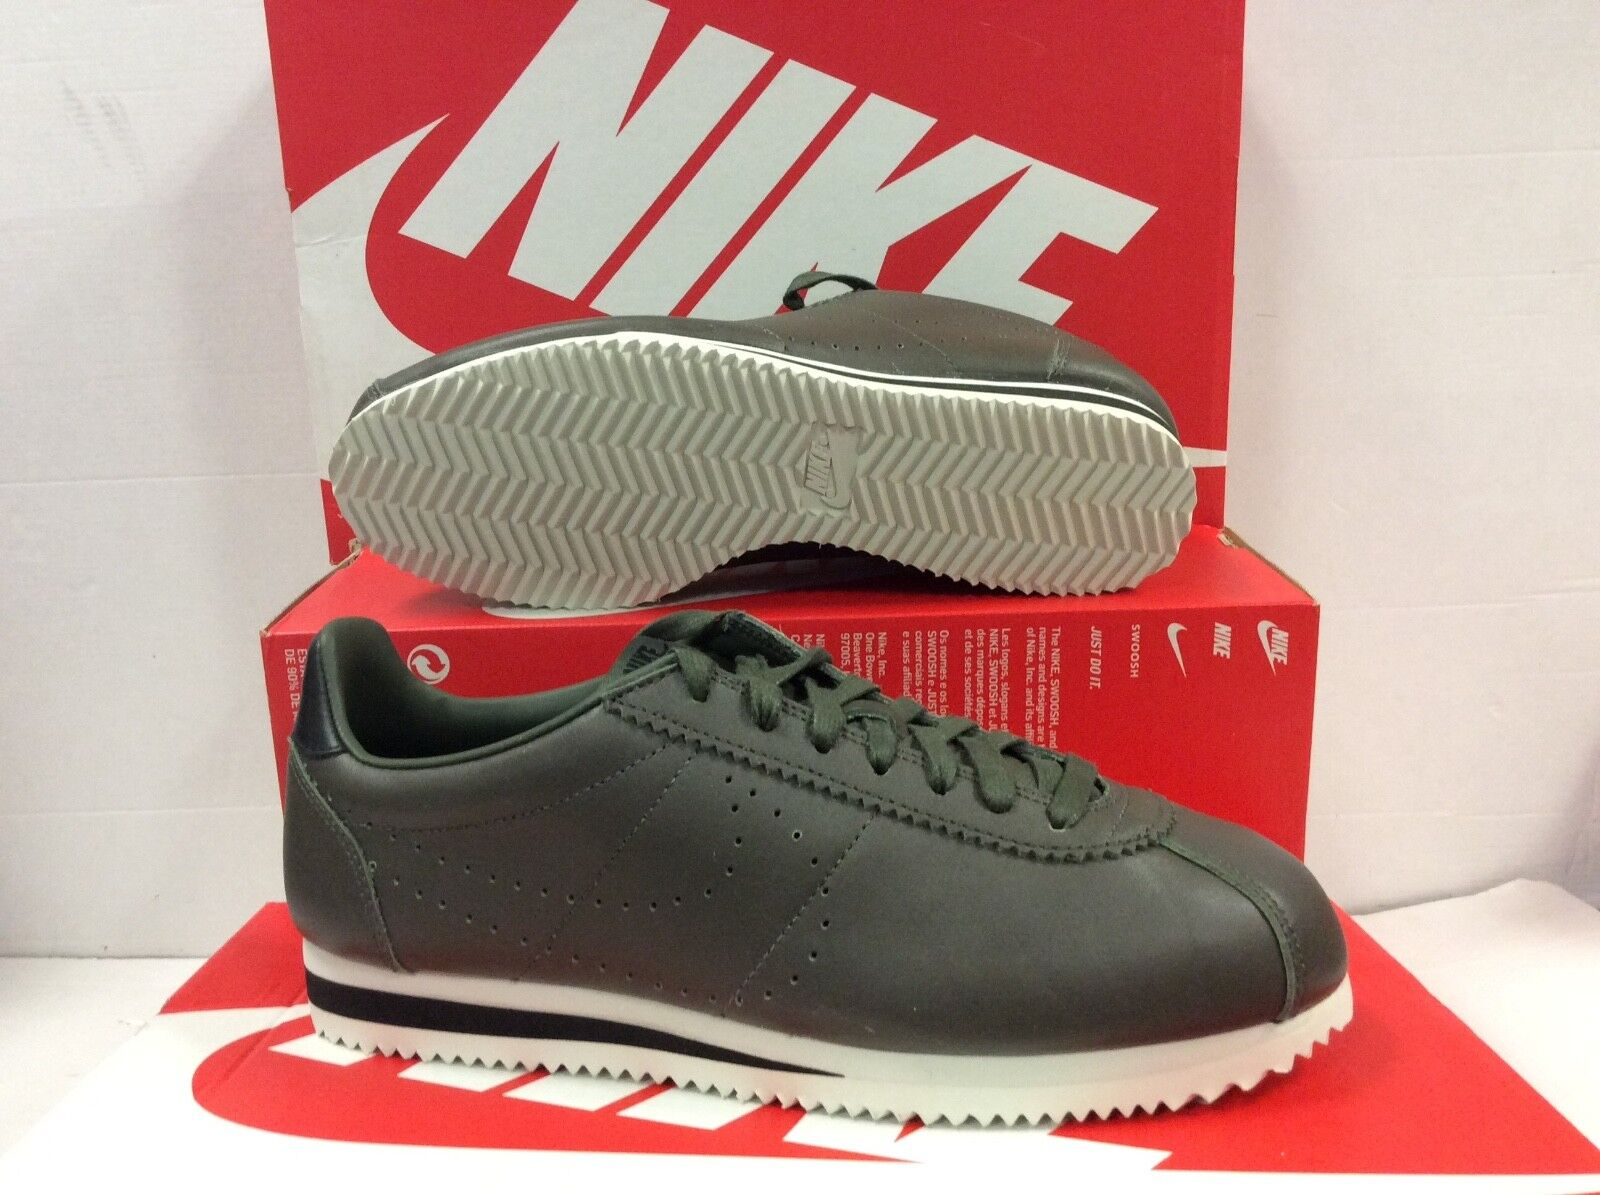 Nike Classic Cortez Premium in Pelle Uomo Scarpe da ginnastica, Taglia /EUR 44